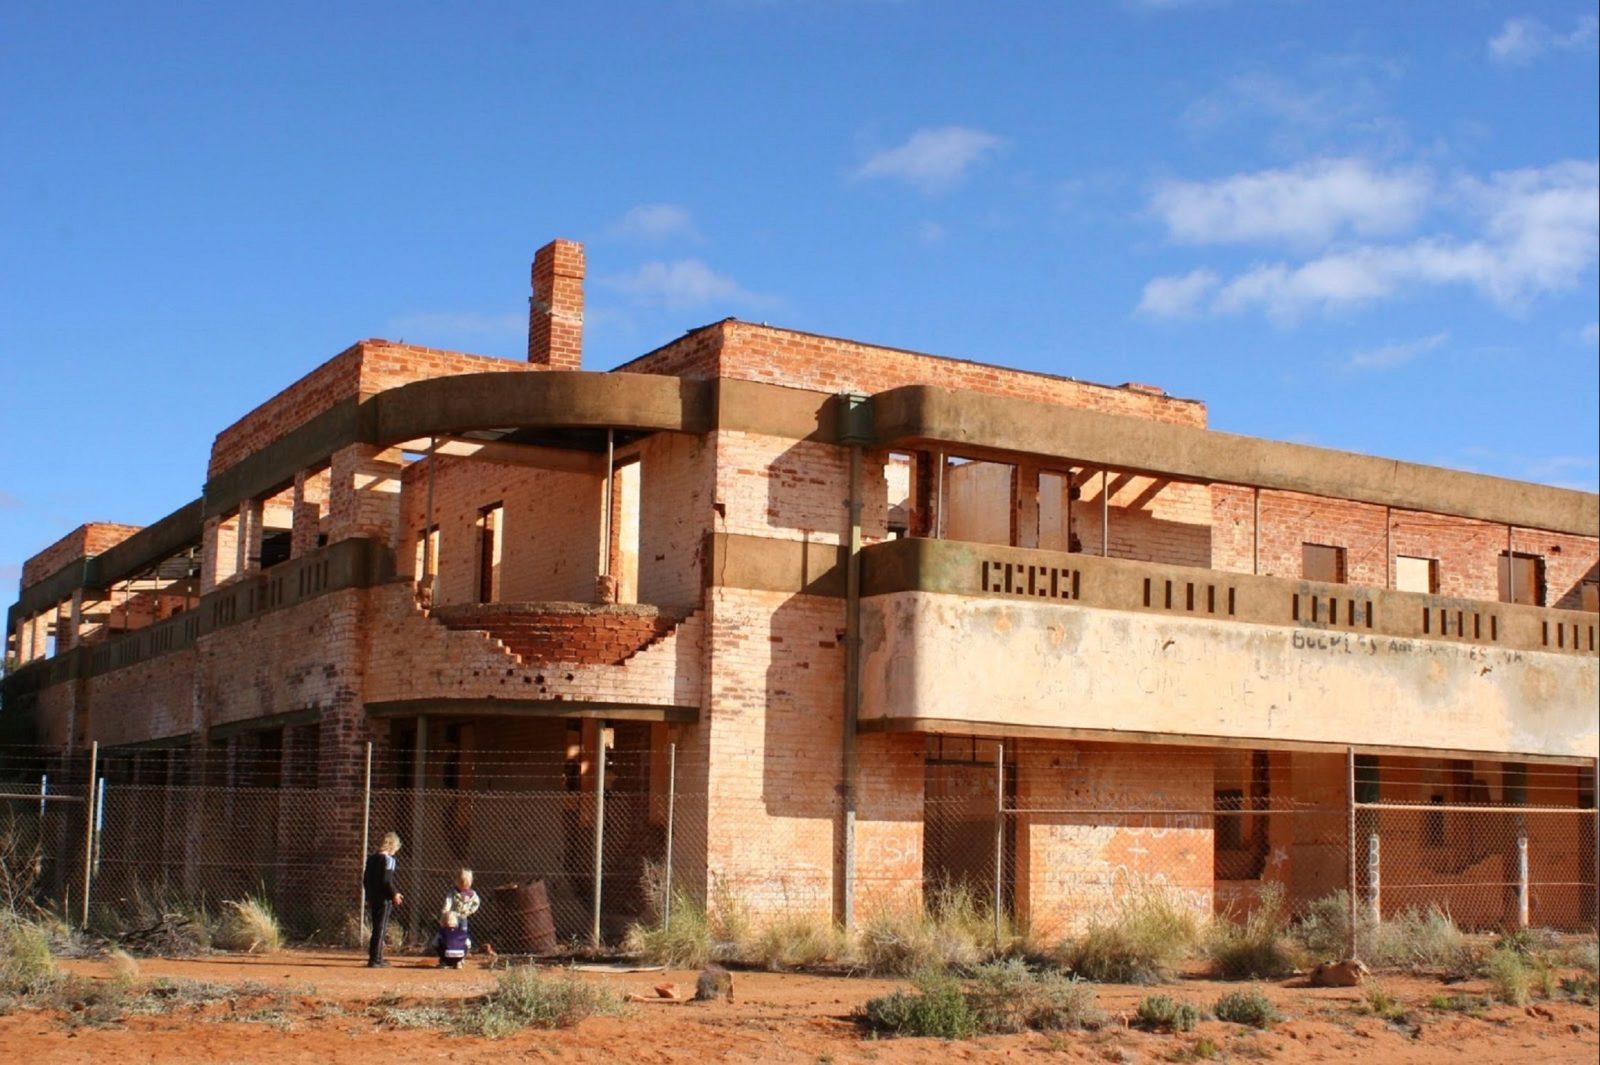 Big Bell Ghost Town, Cue, Western Australia